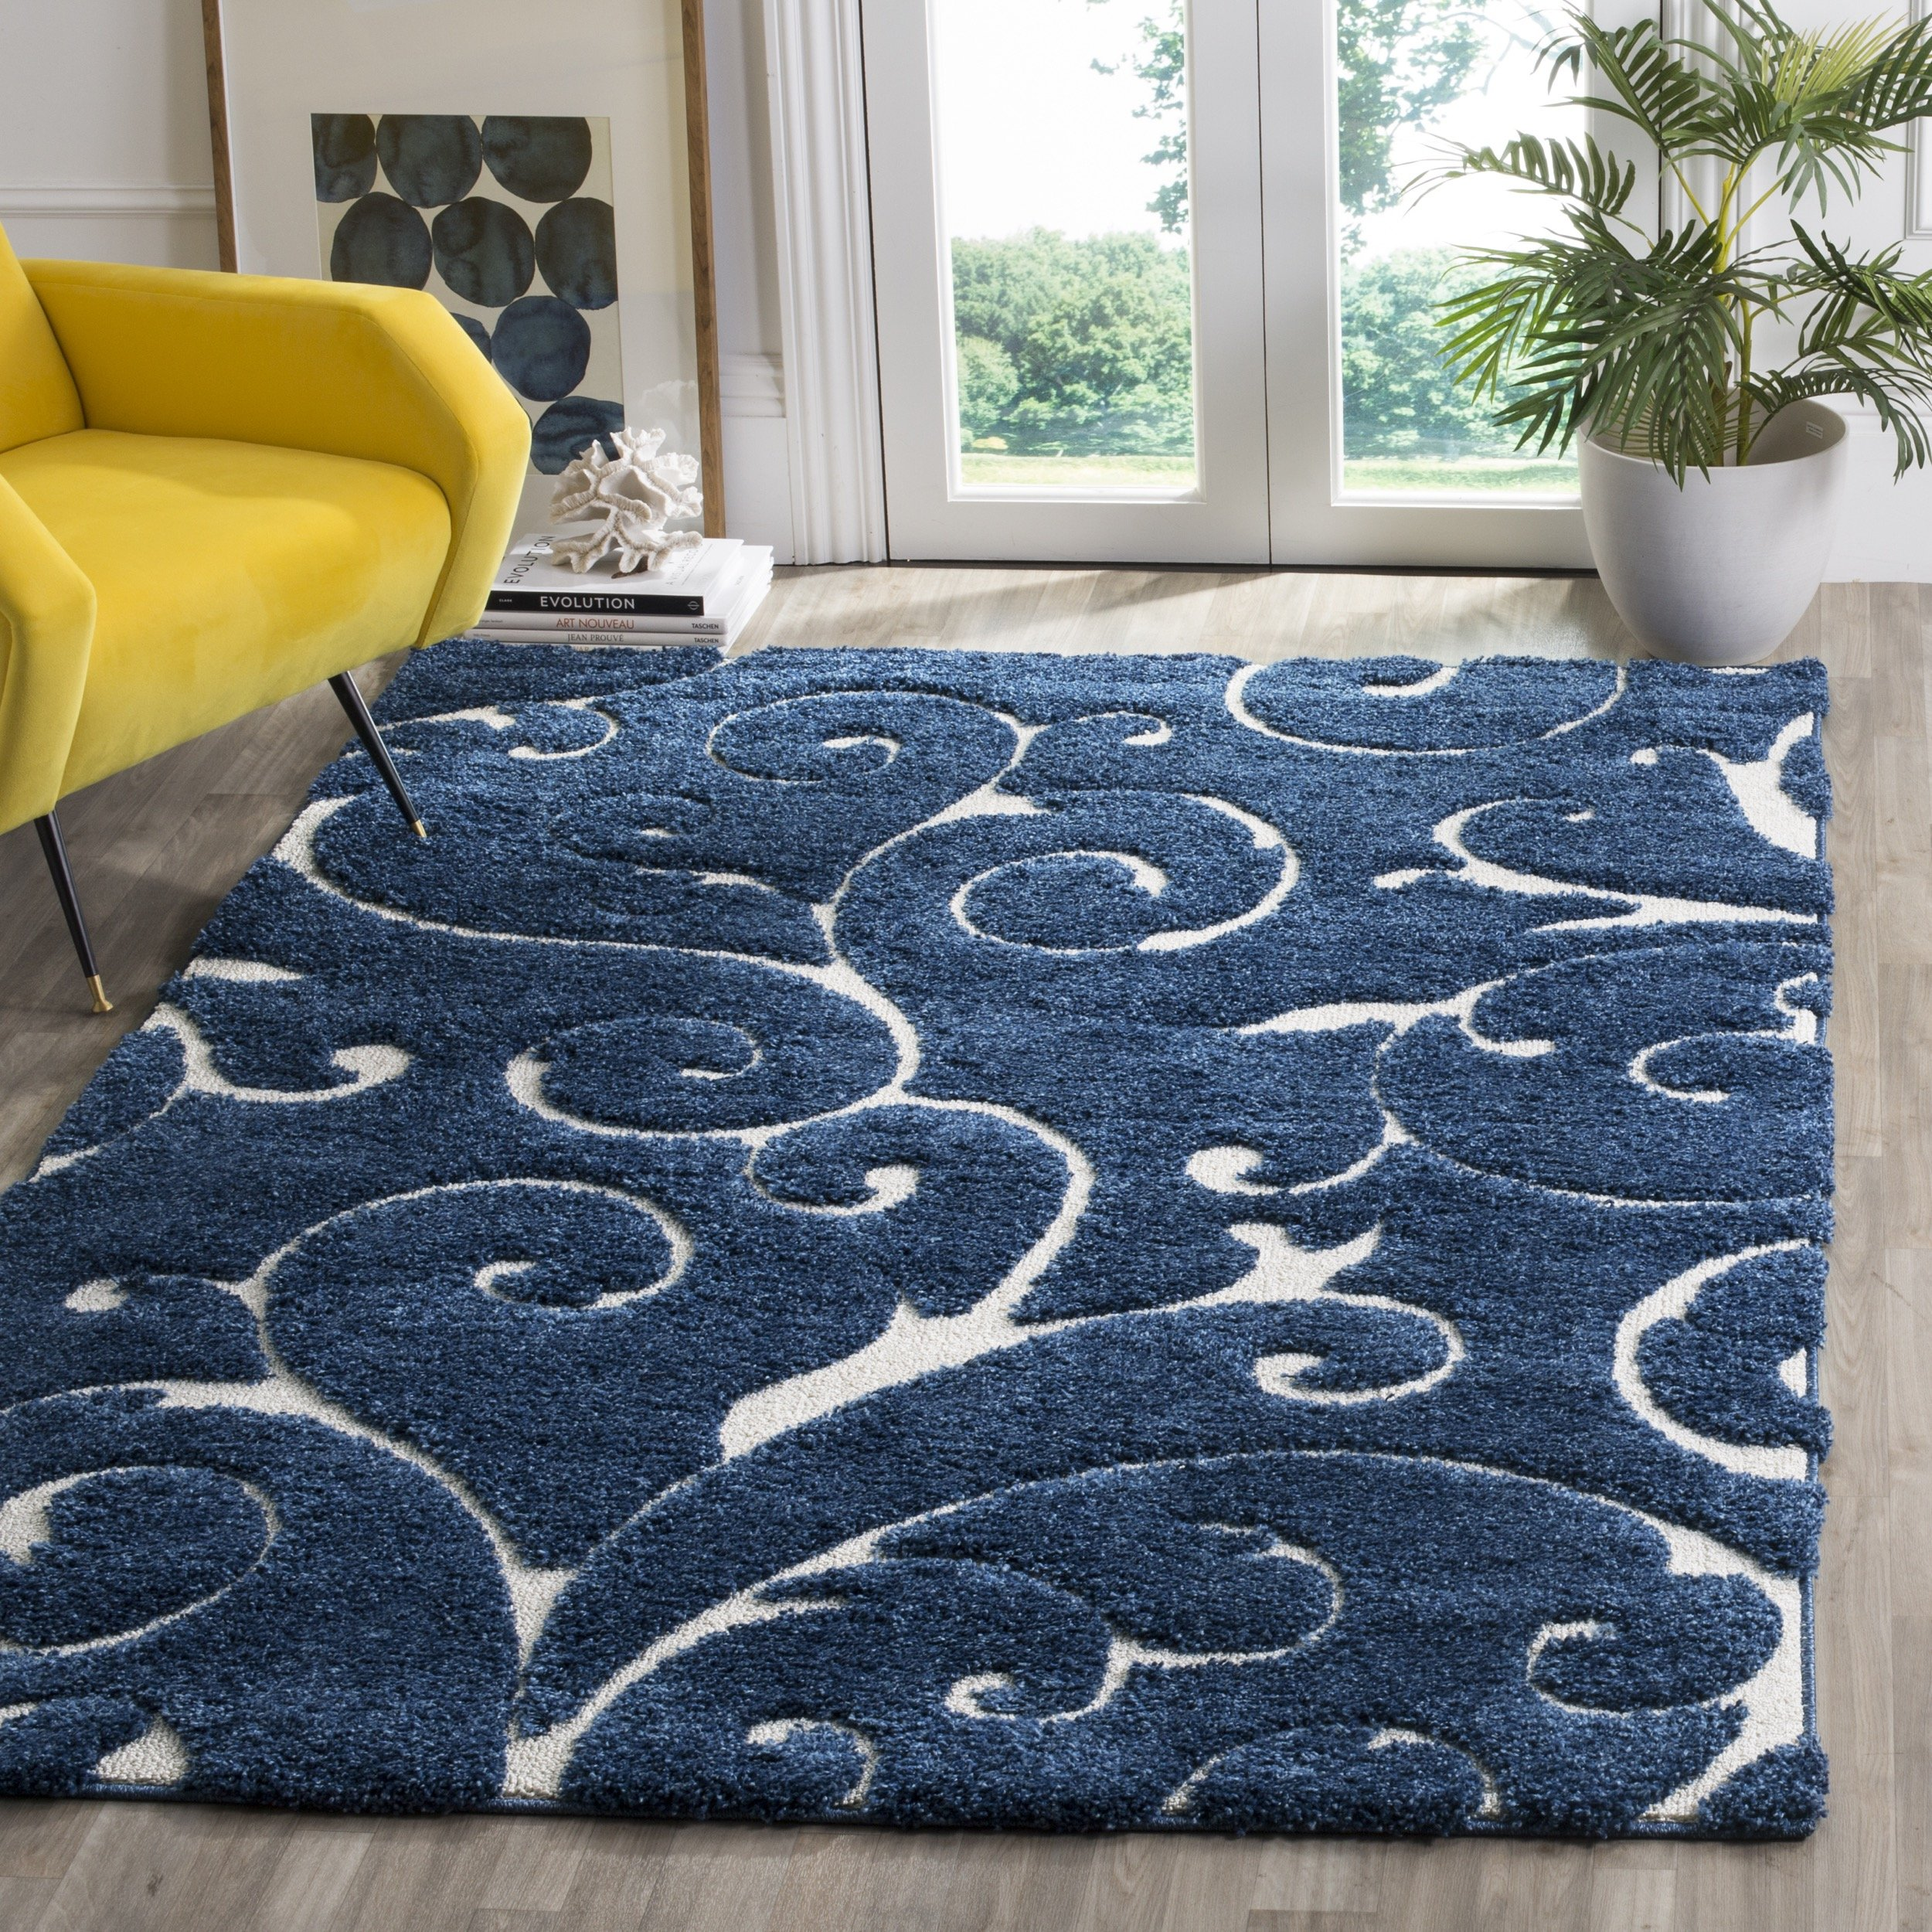 Navy Blue Rugs Amazon Com